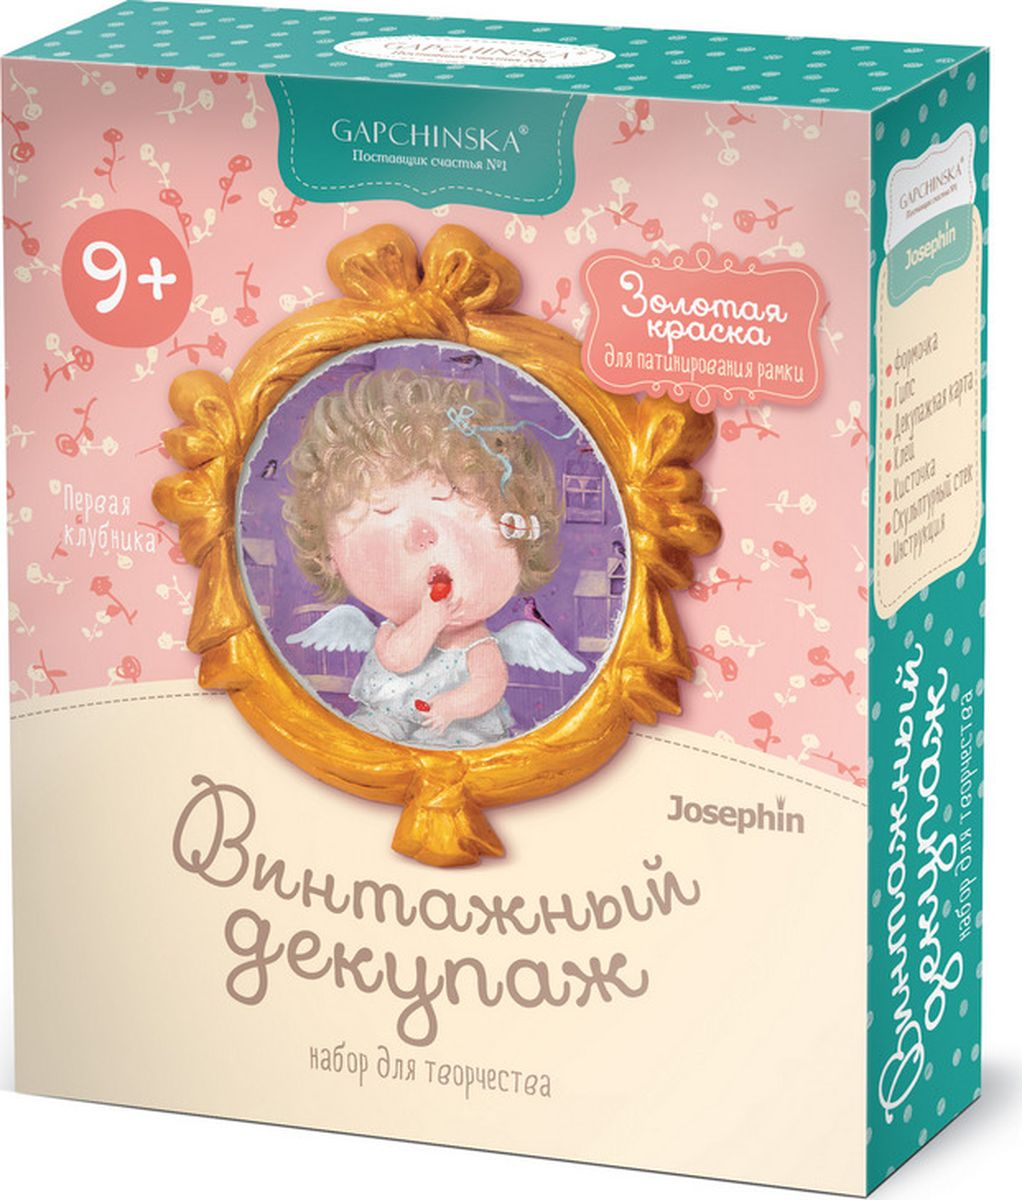 Gapchinska Декупаж Первая клубника